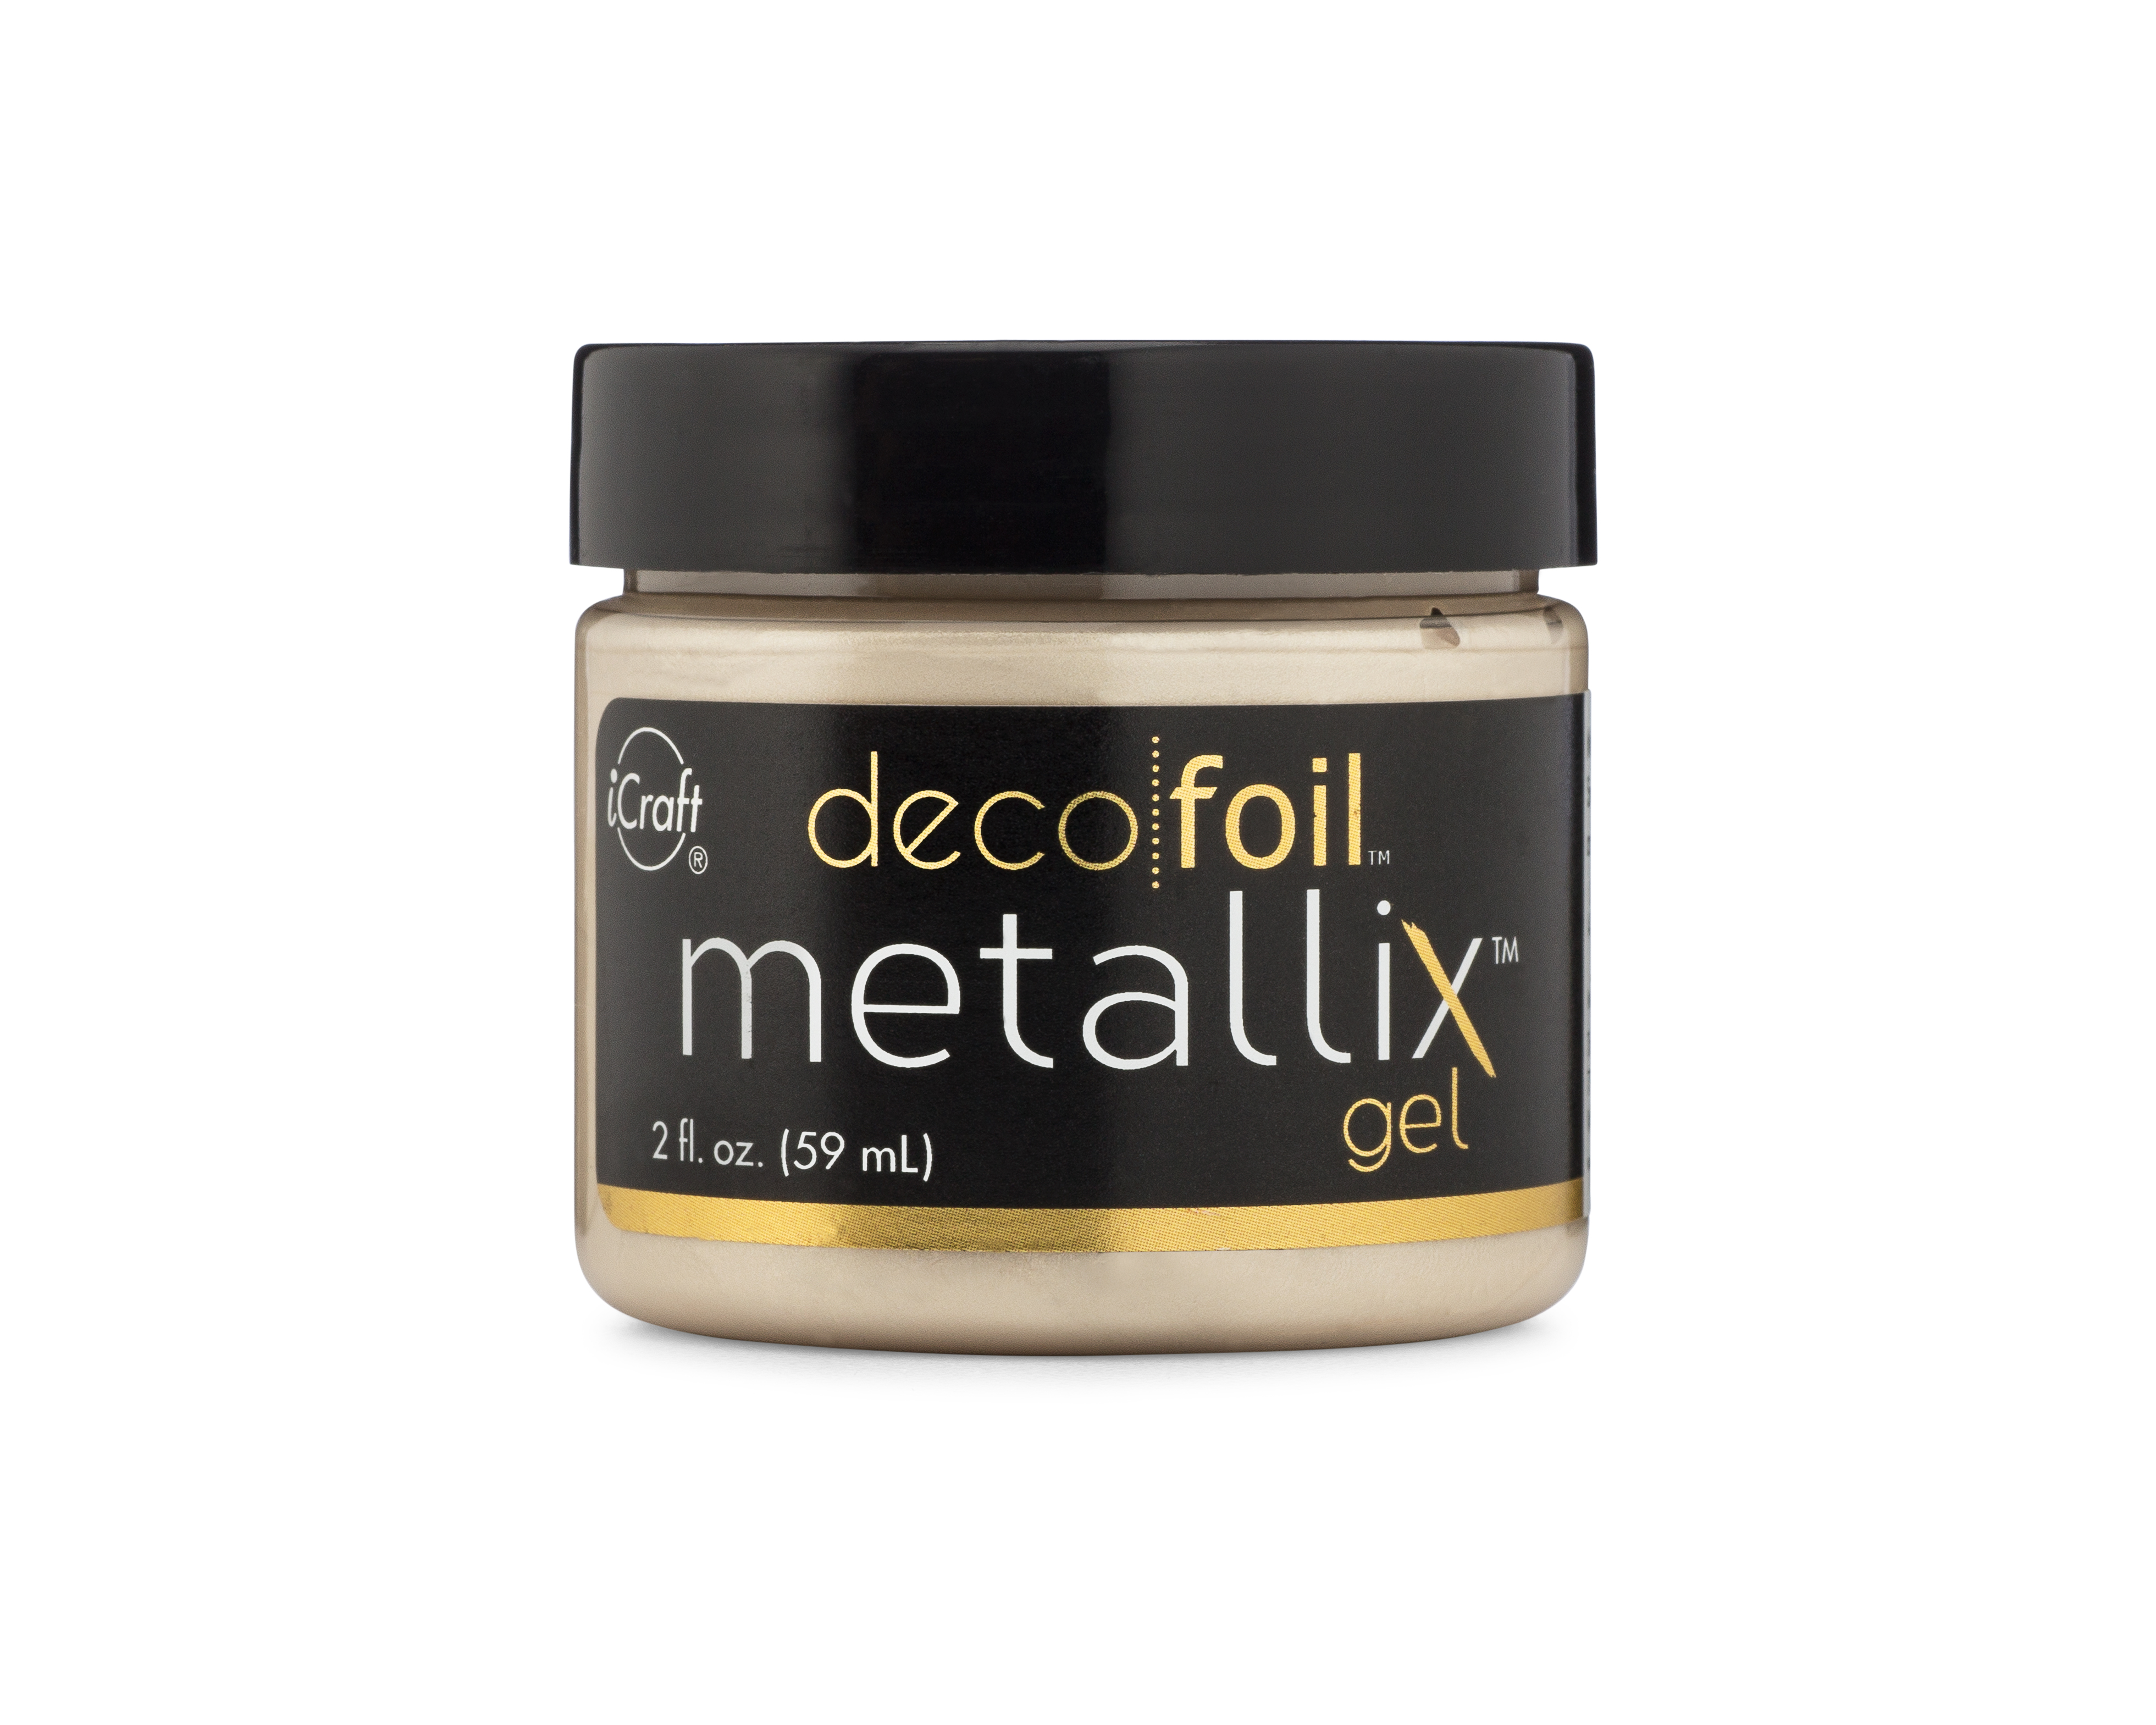 Deco Foil Metallix Gel, Champagne Mist (2 fl oz)